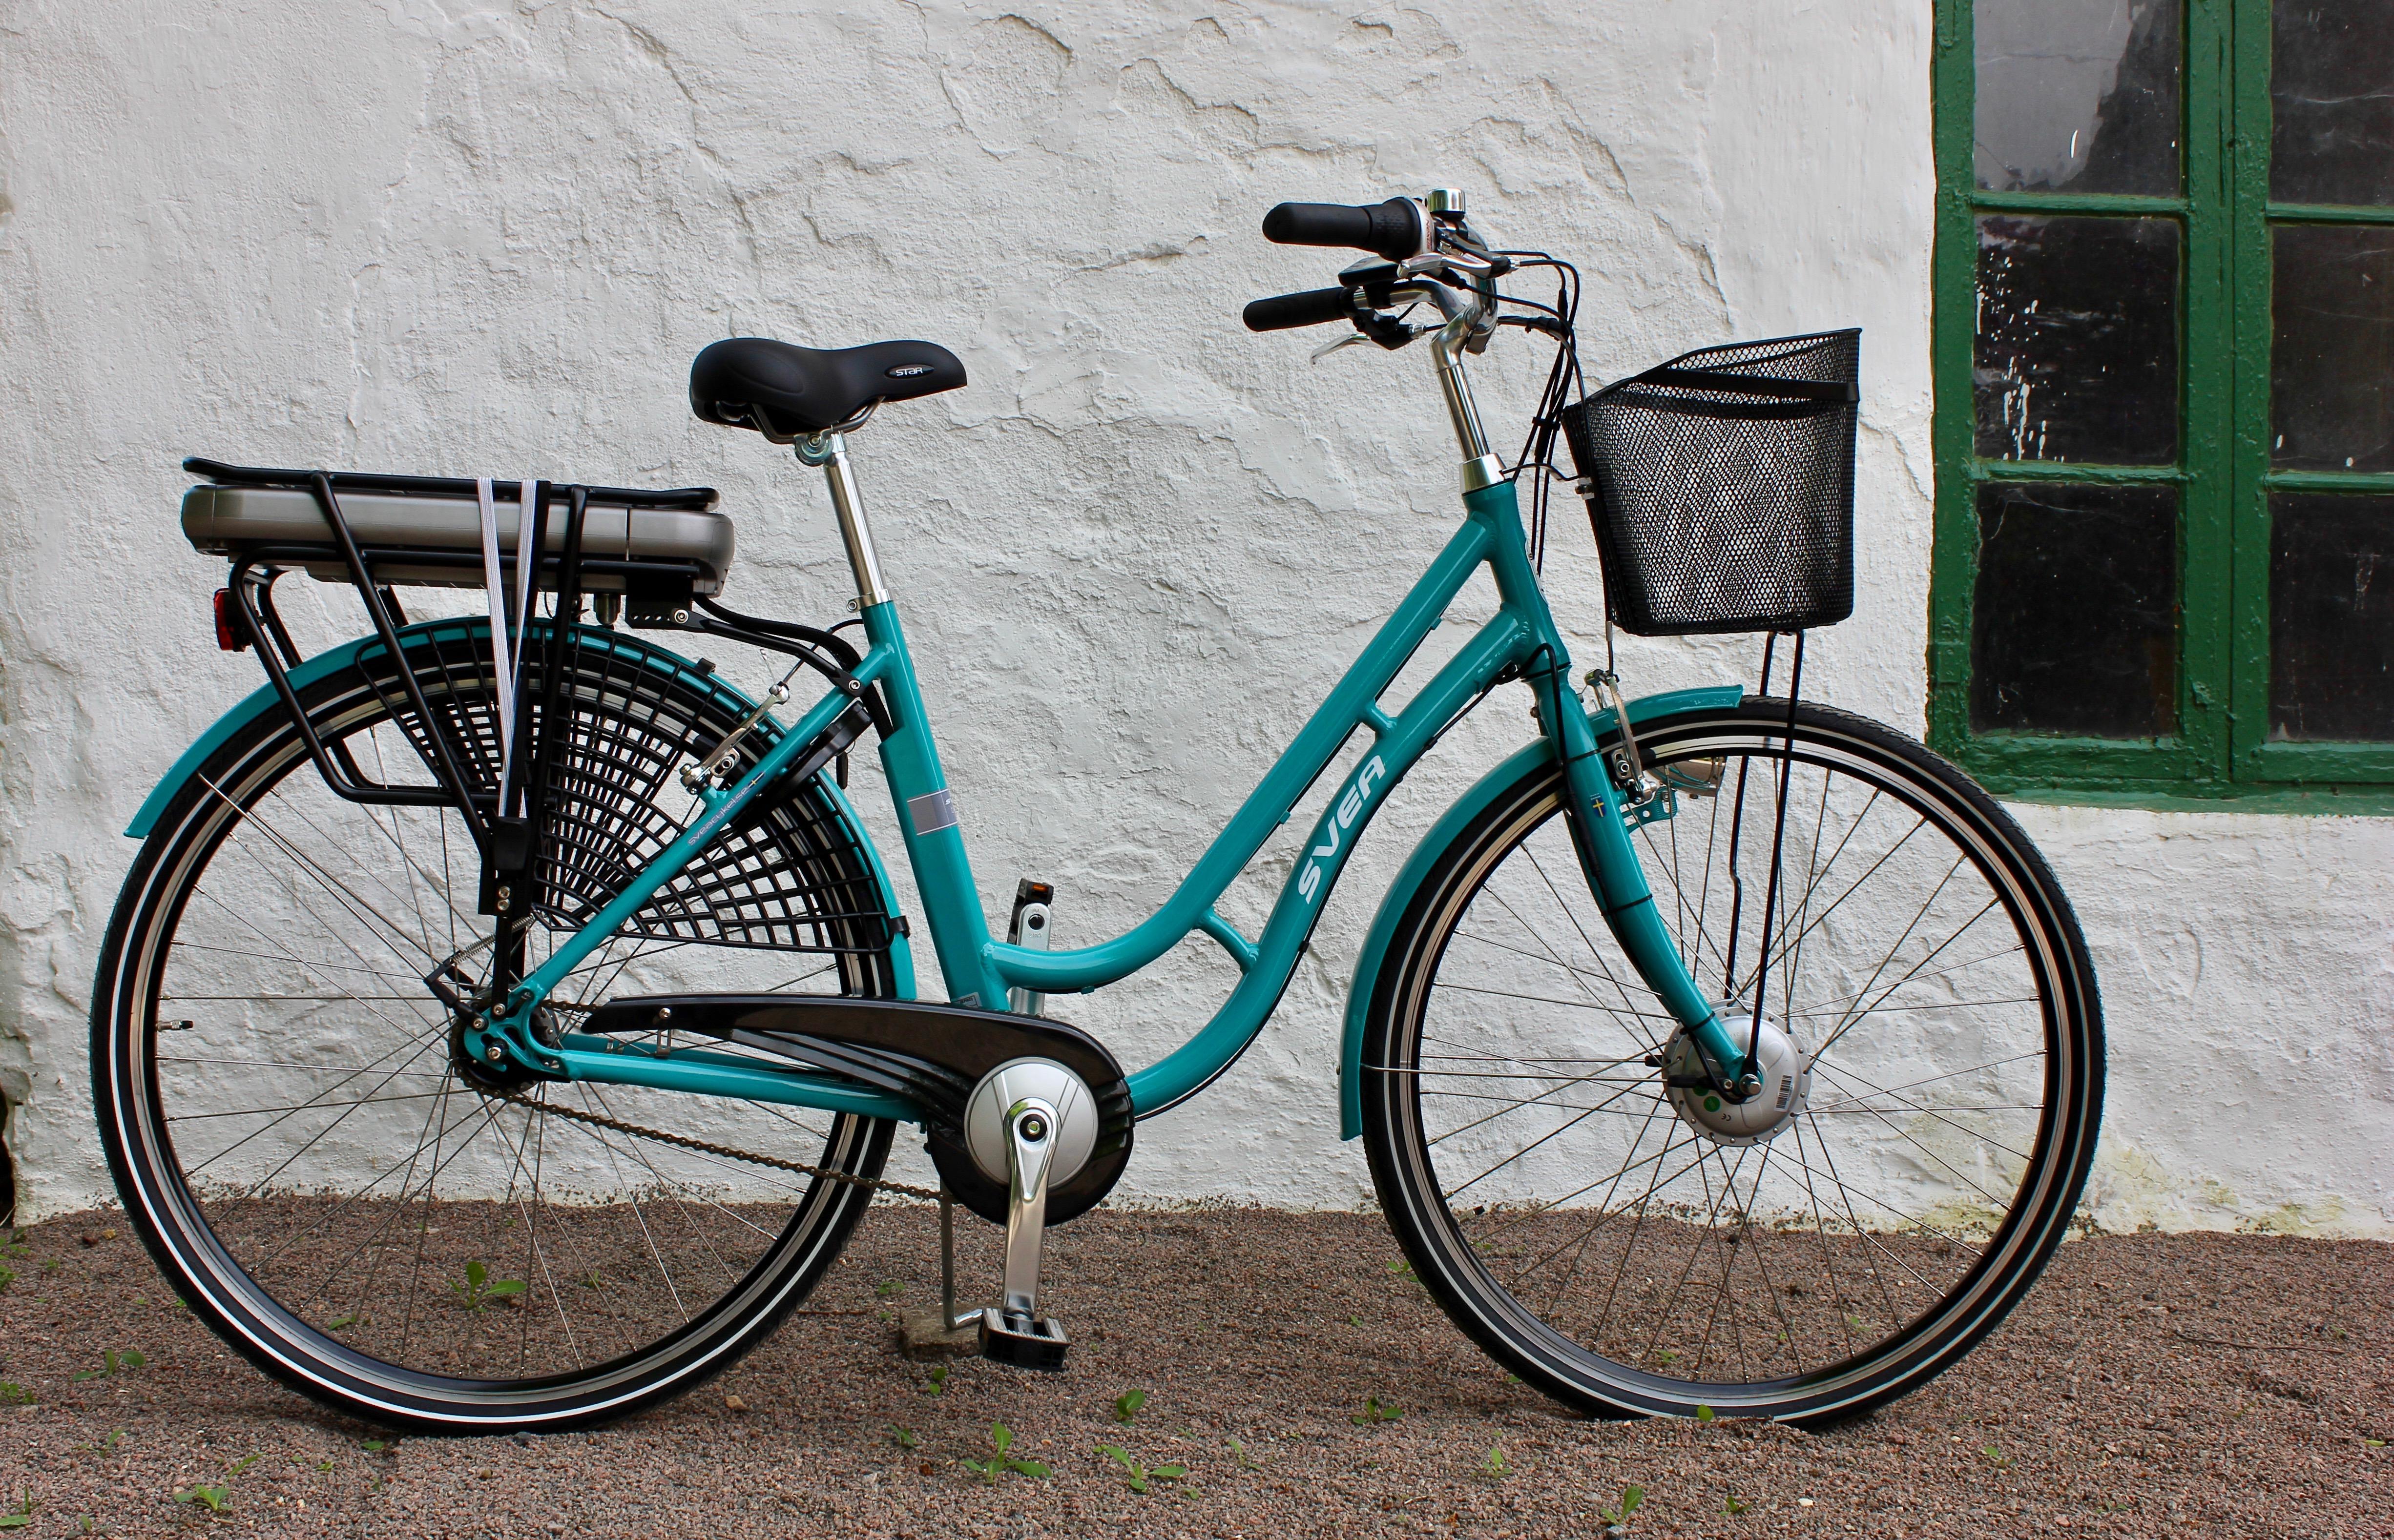 elcyklar el-cykel el-cyklar Jönssons cykelaffär Billesholm